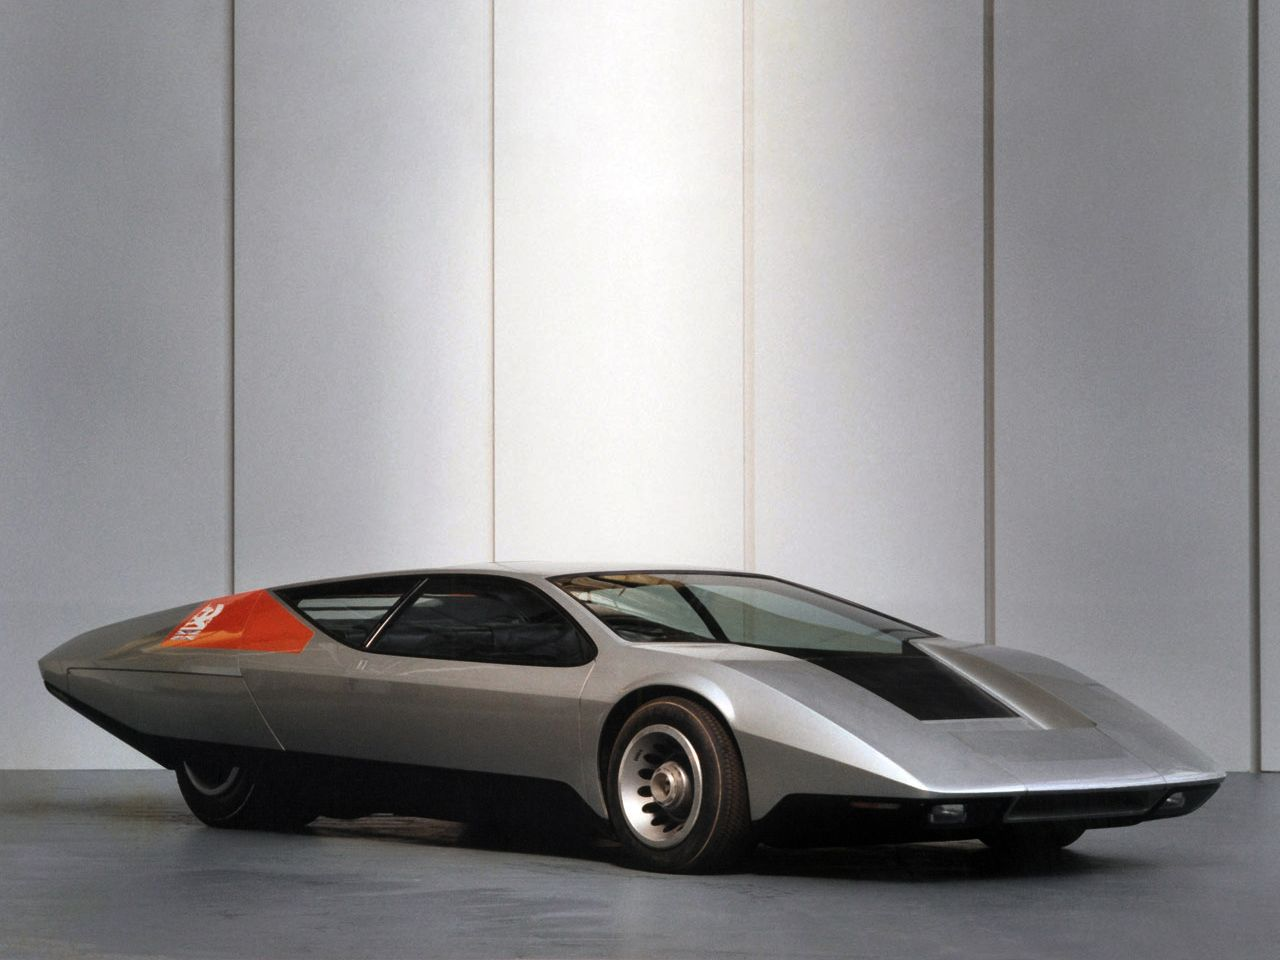 Kahblog Concept Cars Vintage Concept Cars 70s Cars